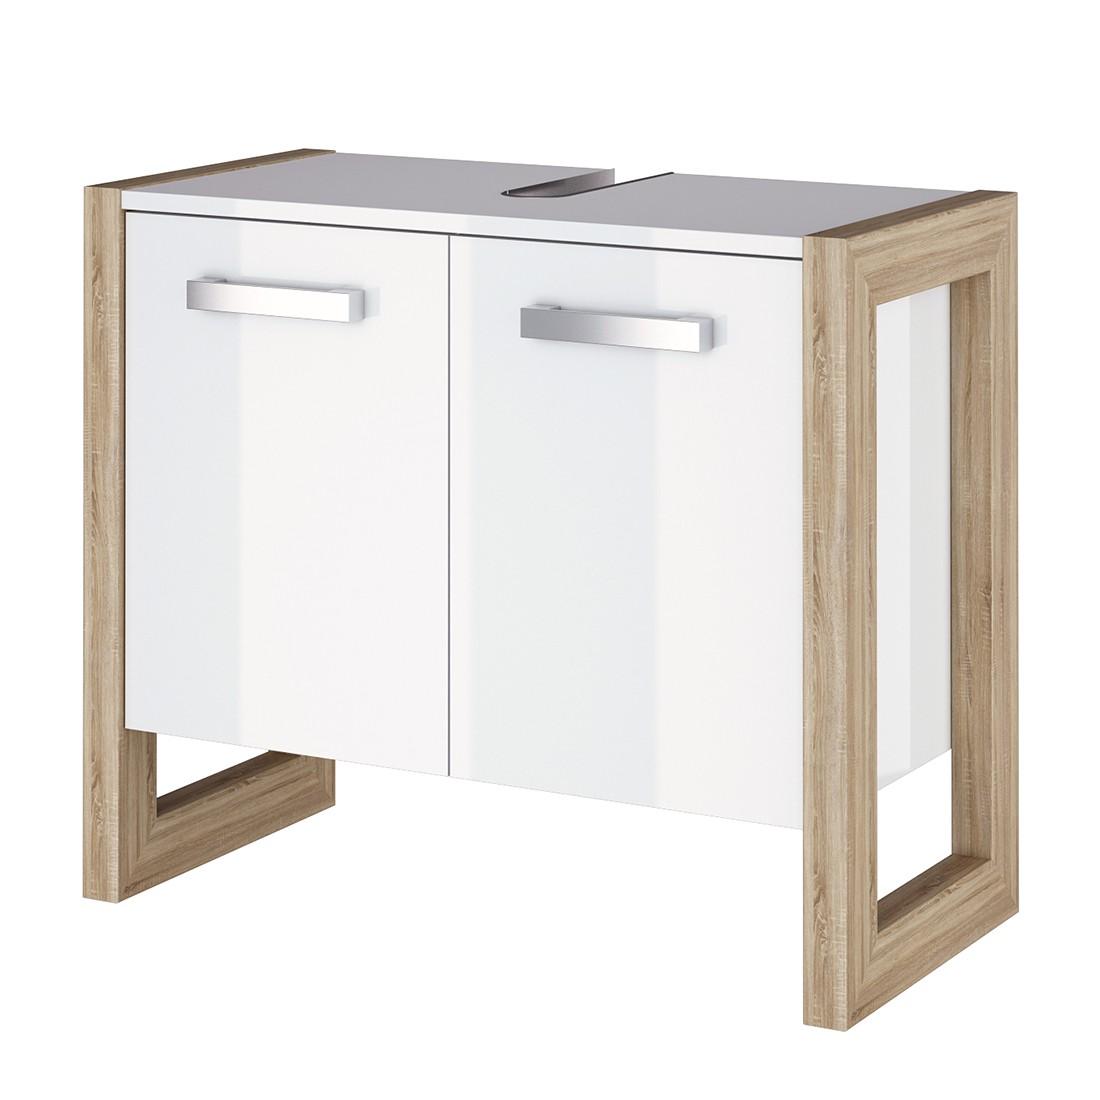 Armadietto da lavabo Kolind - Bianco lucido lavandino, Schildmeyer